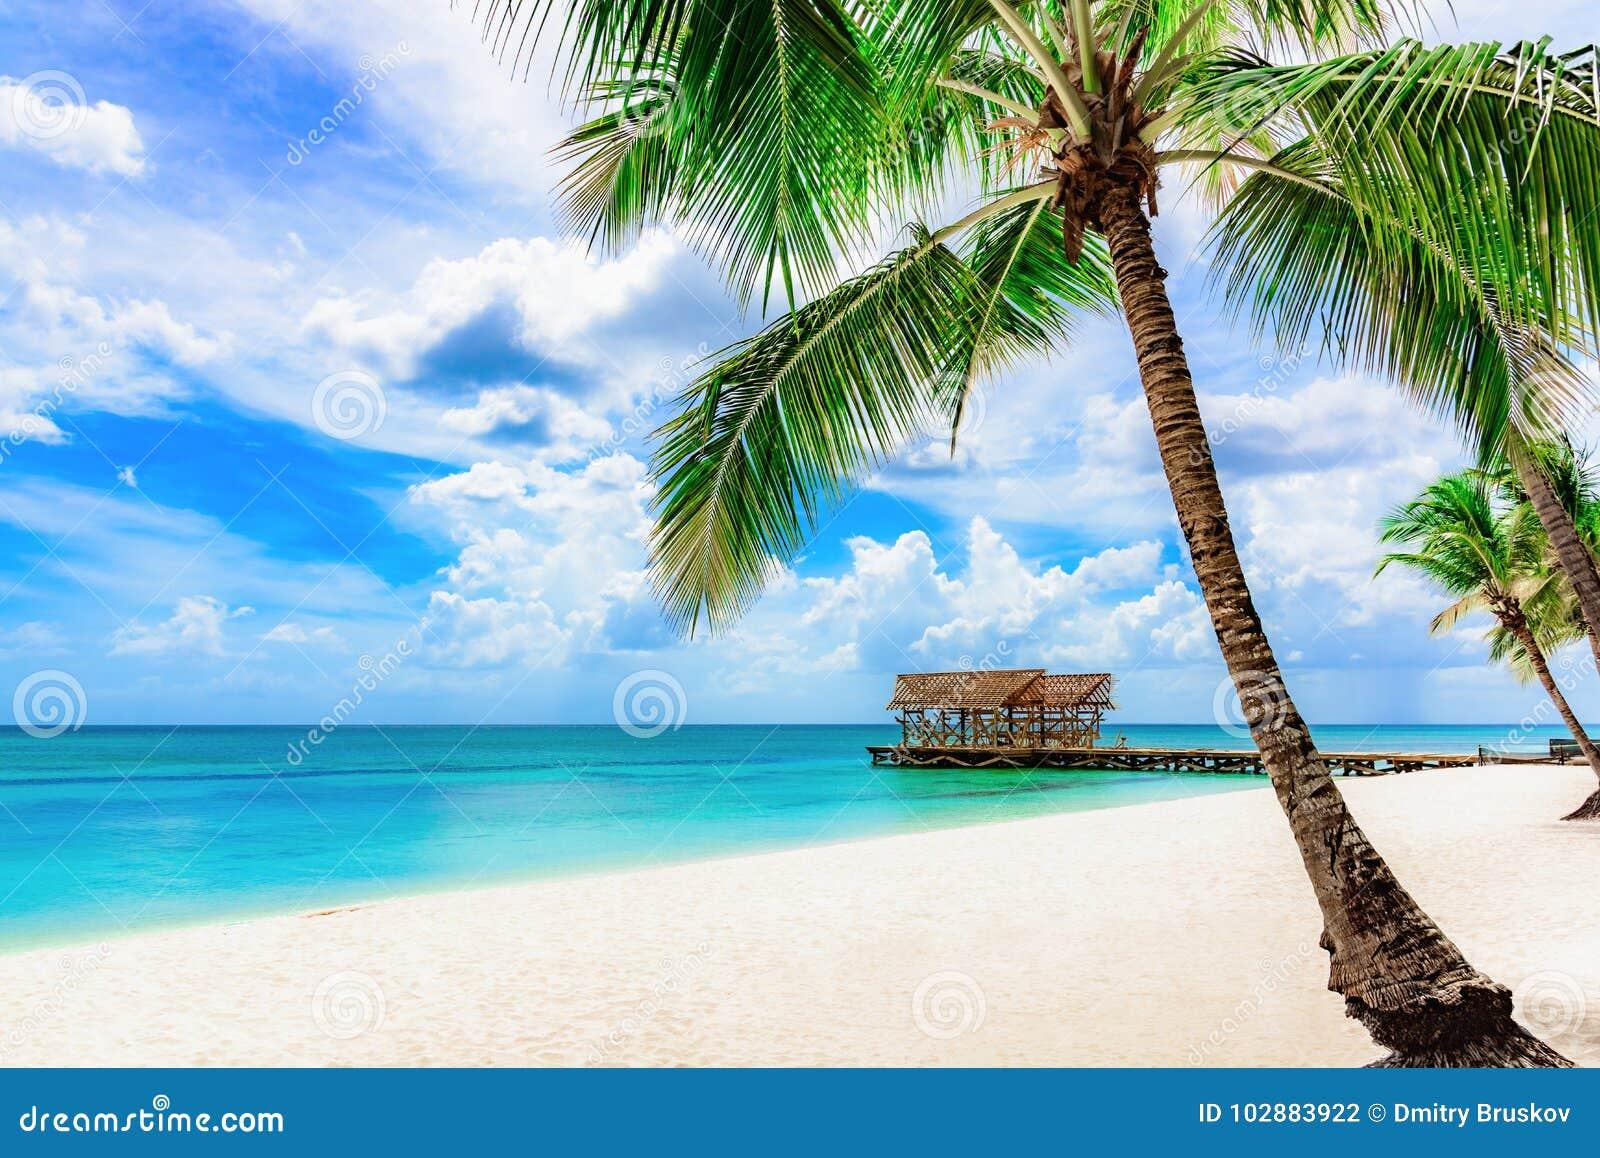 Hd Tropical Island Beach Paradise Wallpapers And Backgrounds: Paradise Tropical Beach Palm The Caribbean Sea Stock Photo